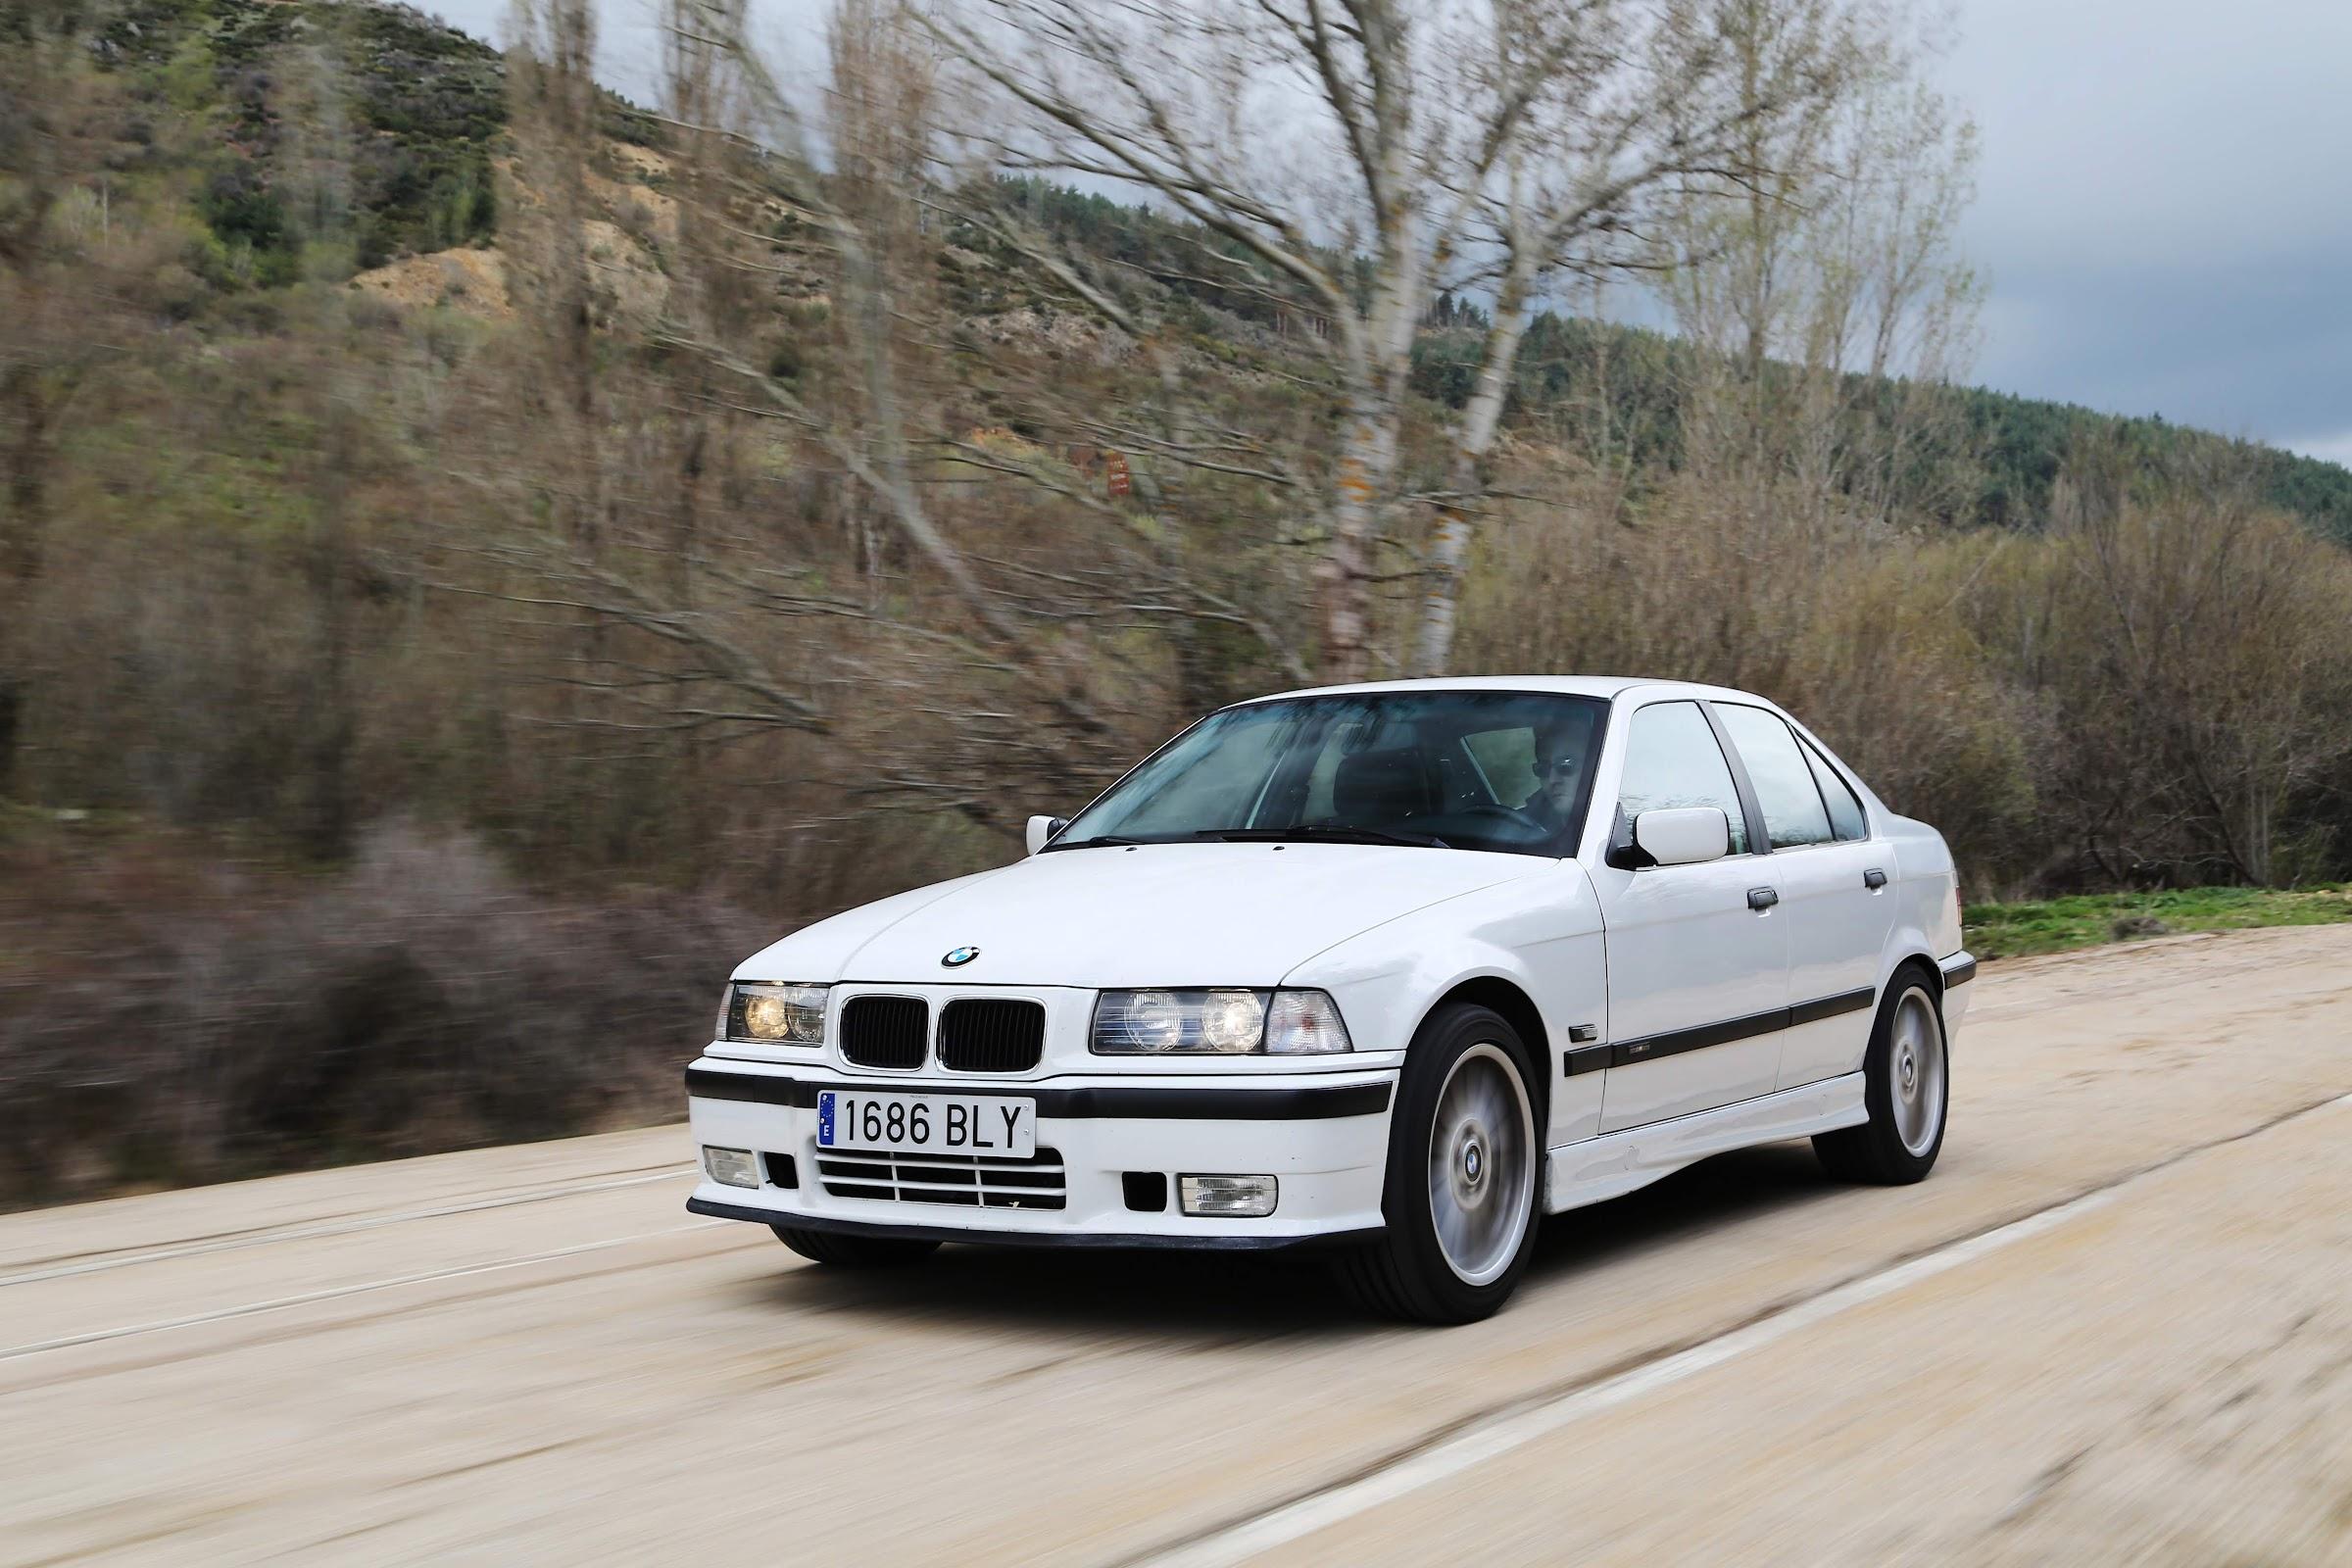 P6OgIlfKBnaMmLUPfq9P6v8DS6B6PWjWhi1revF29lL7H2pN78HzZHv3qfILLJMxarp9KFrRCRmJdw50e5cfVVVNly88wPoKRu6liE52yCTFtd5OX9tMrMWrGh3fqffXd3iAasHZ2Q=w2400 - La historia de una berlina: Serie 3 de BMW